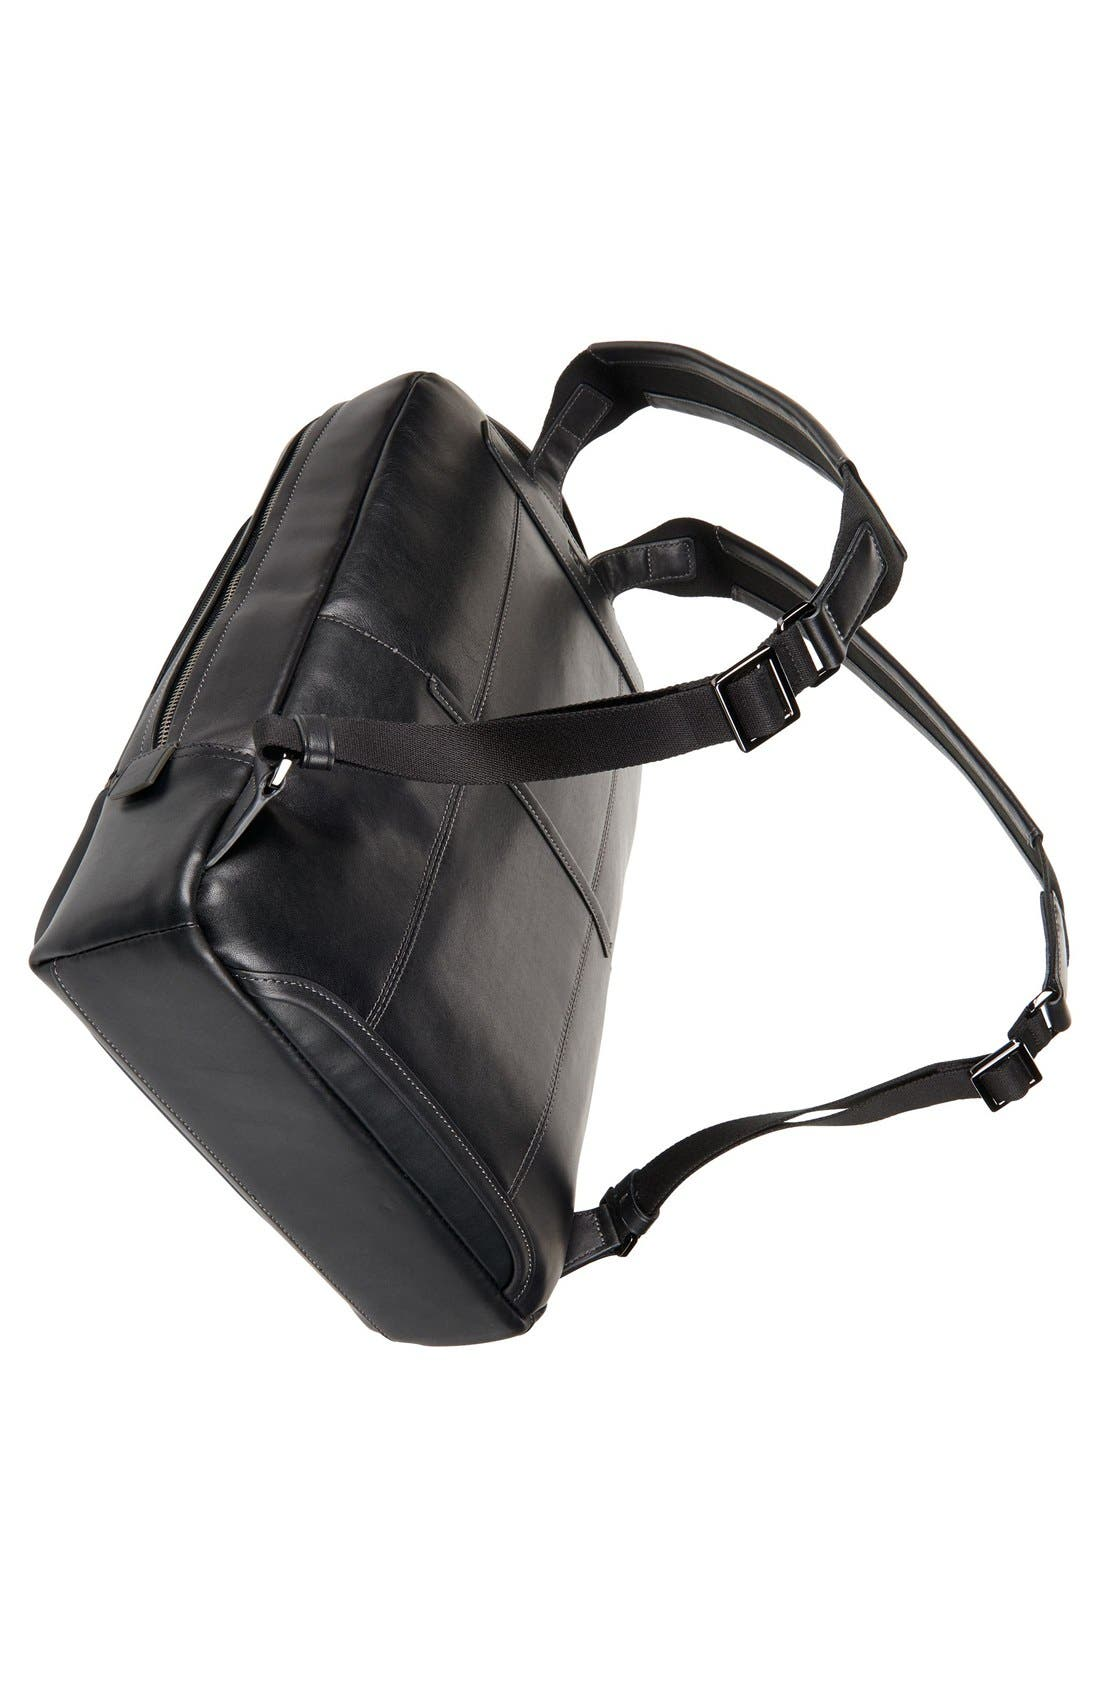 'Harrison - Bates' Leather Backpack,                             Alternate thumbnail 4, color,                             001